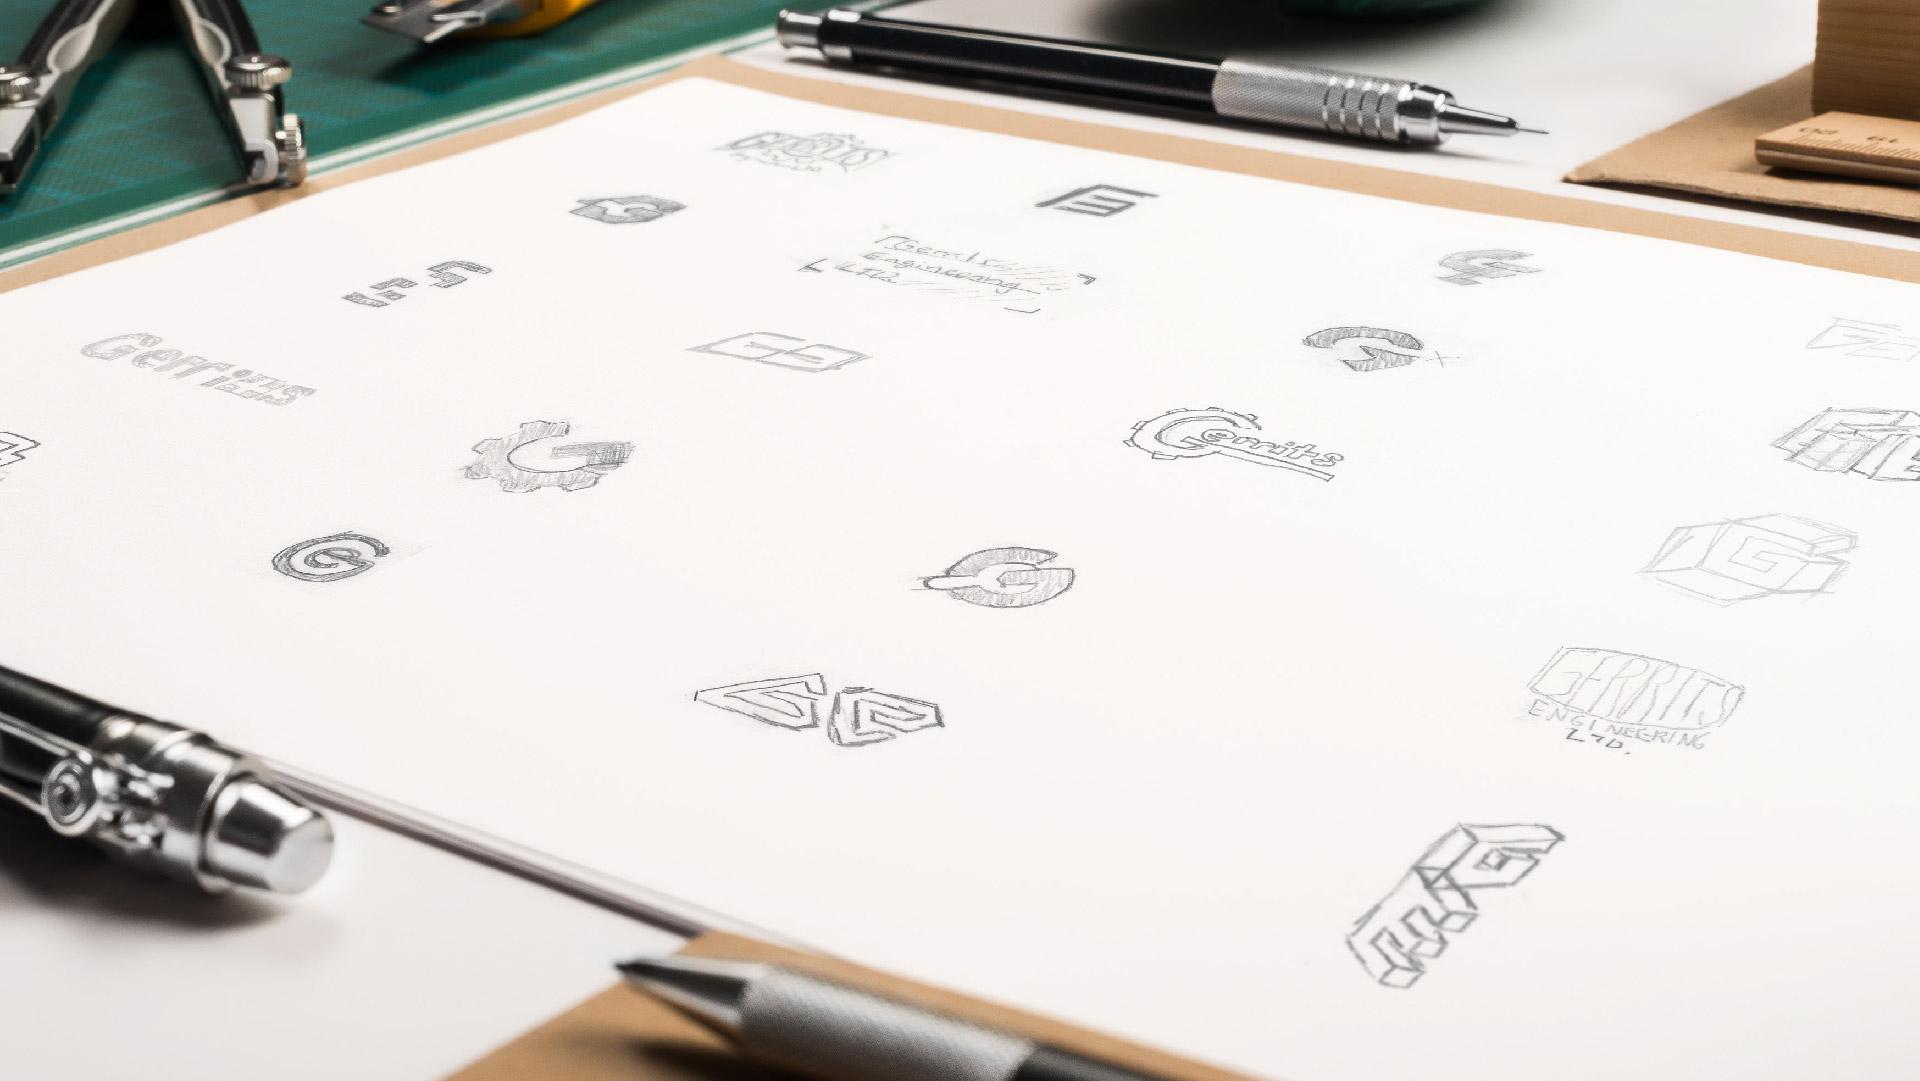 gerrits engineering hand drawn logo concepts